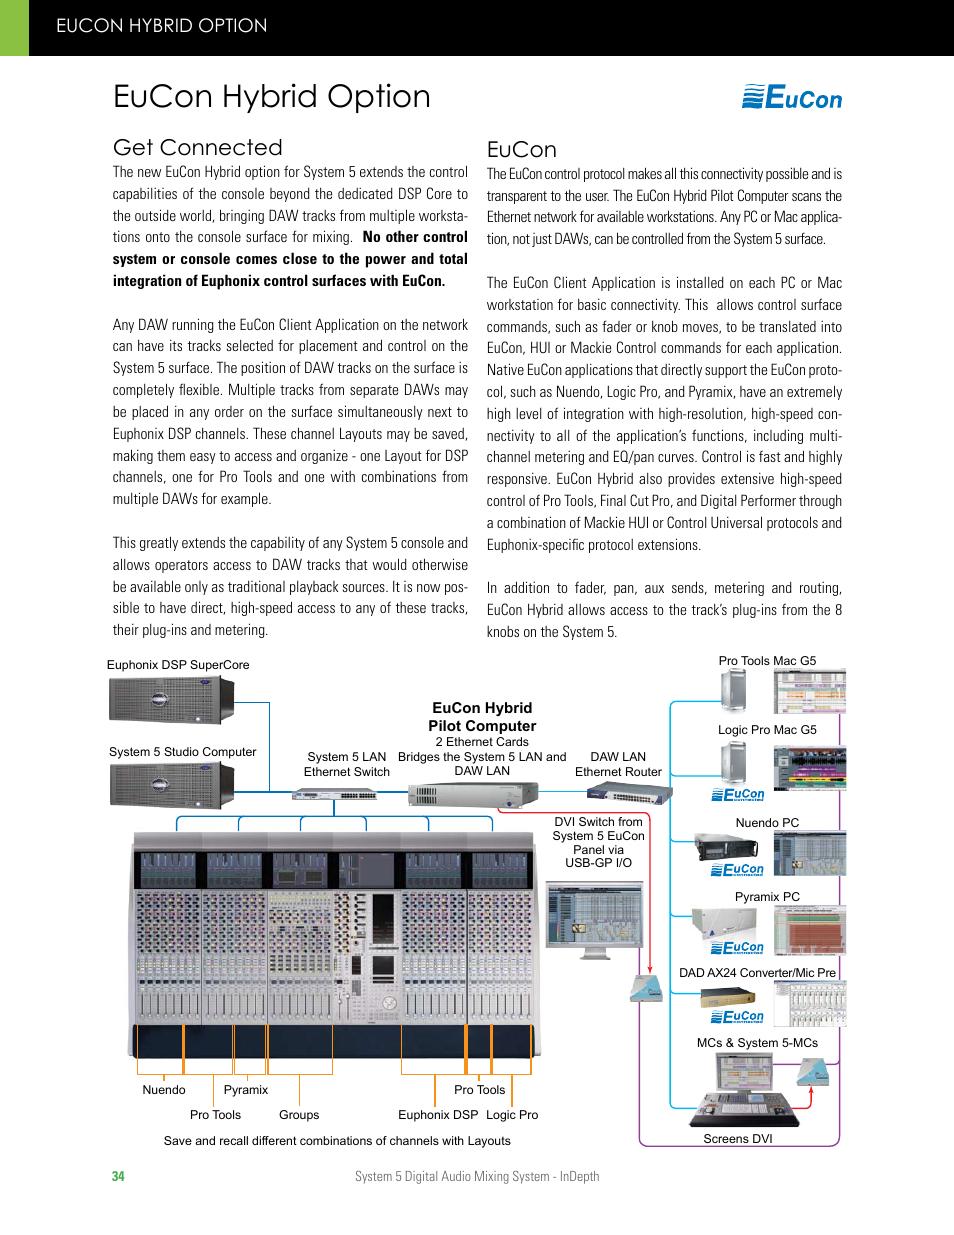 Eucon hybrid option, Get connected, Eucon | Euphonix System